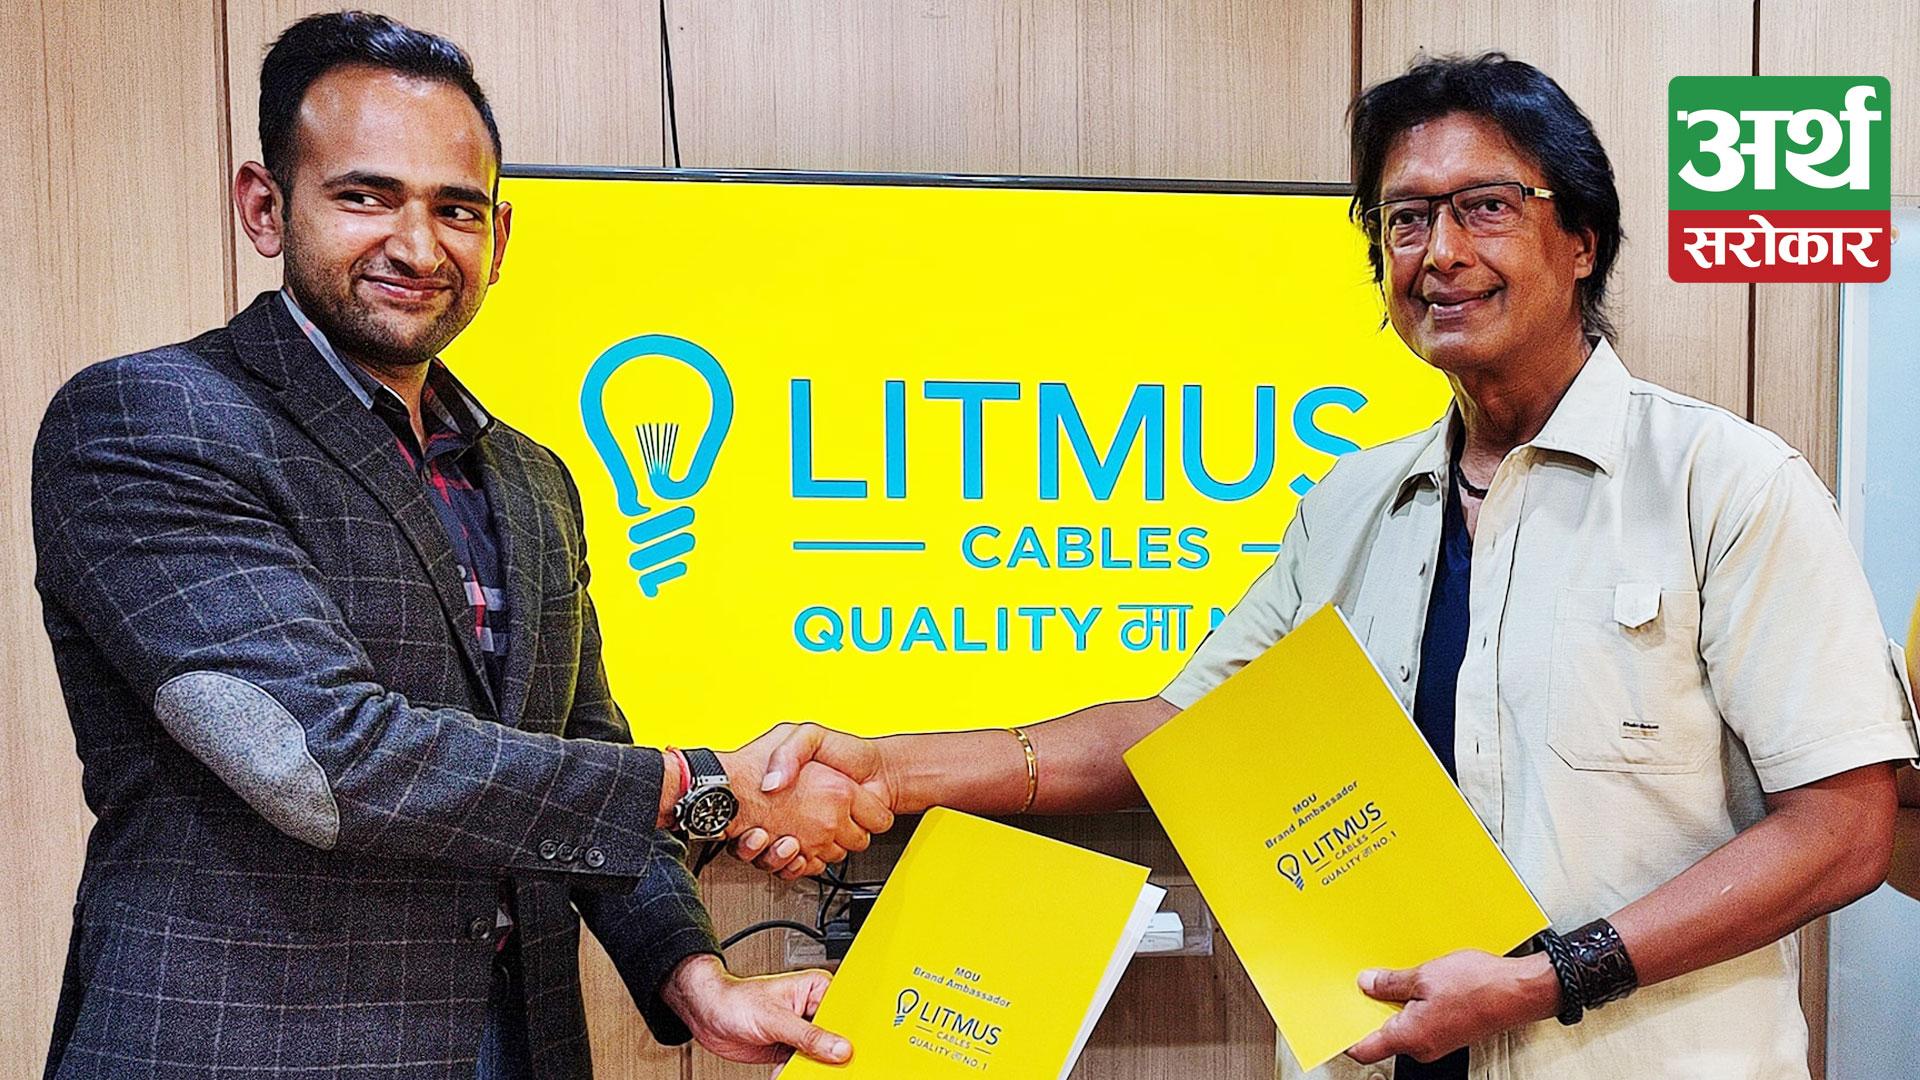 Litmus Cables signs Superstar Rajesh Hamal & Madhu Hamal Bhattarai as Brand Ambassador